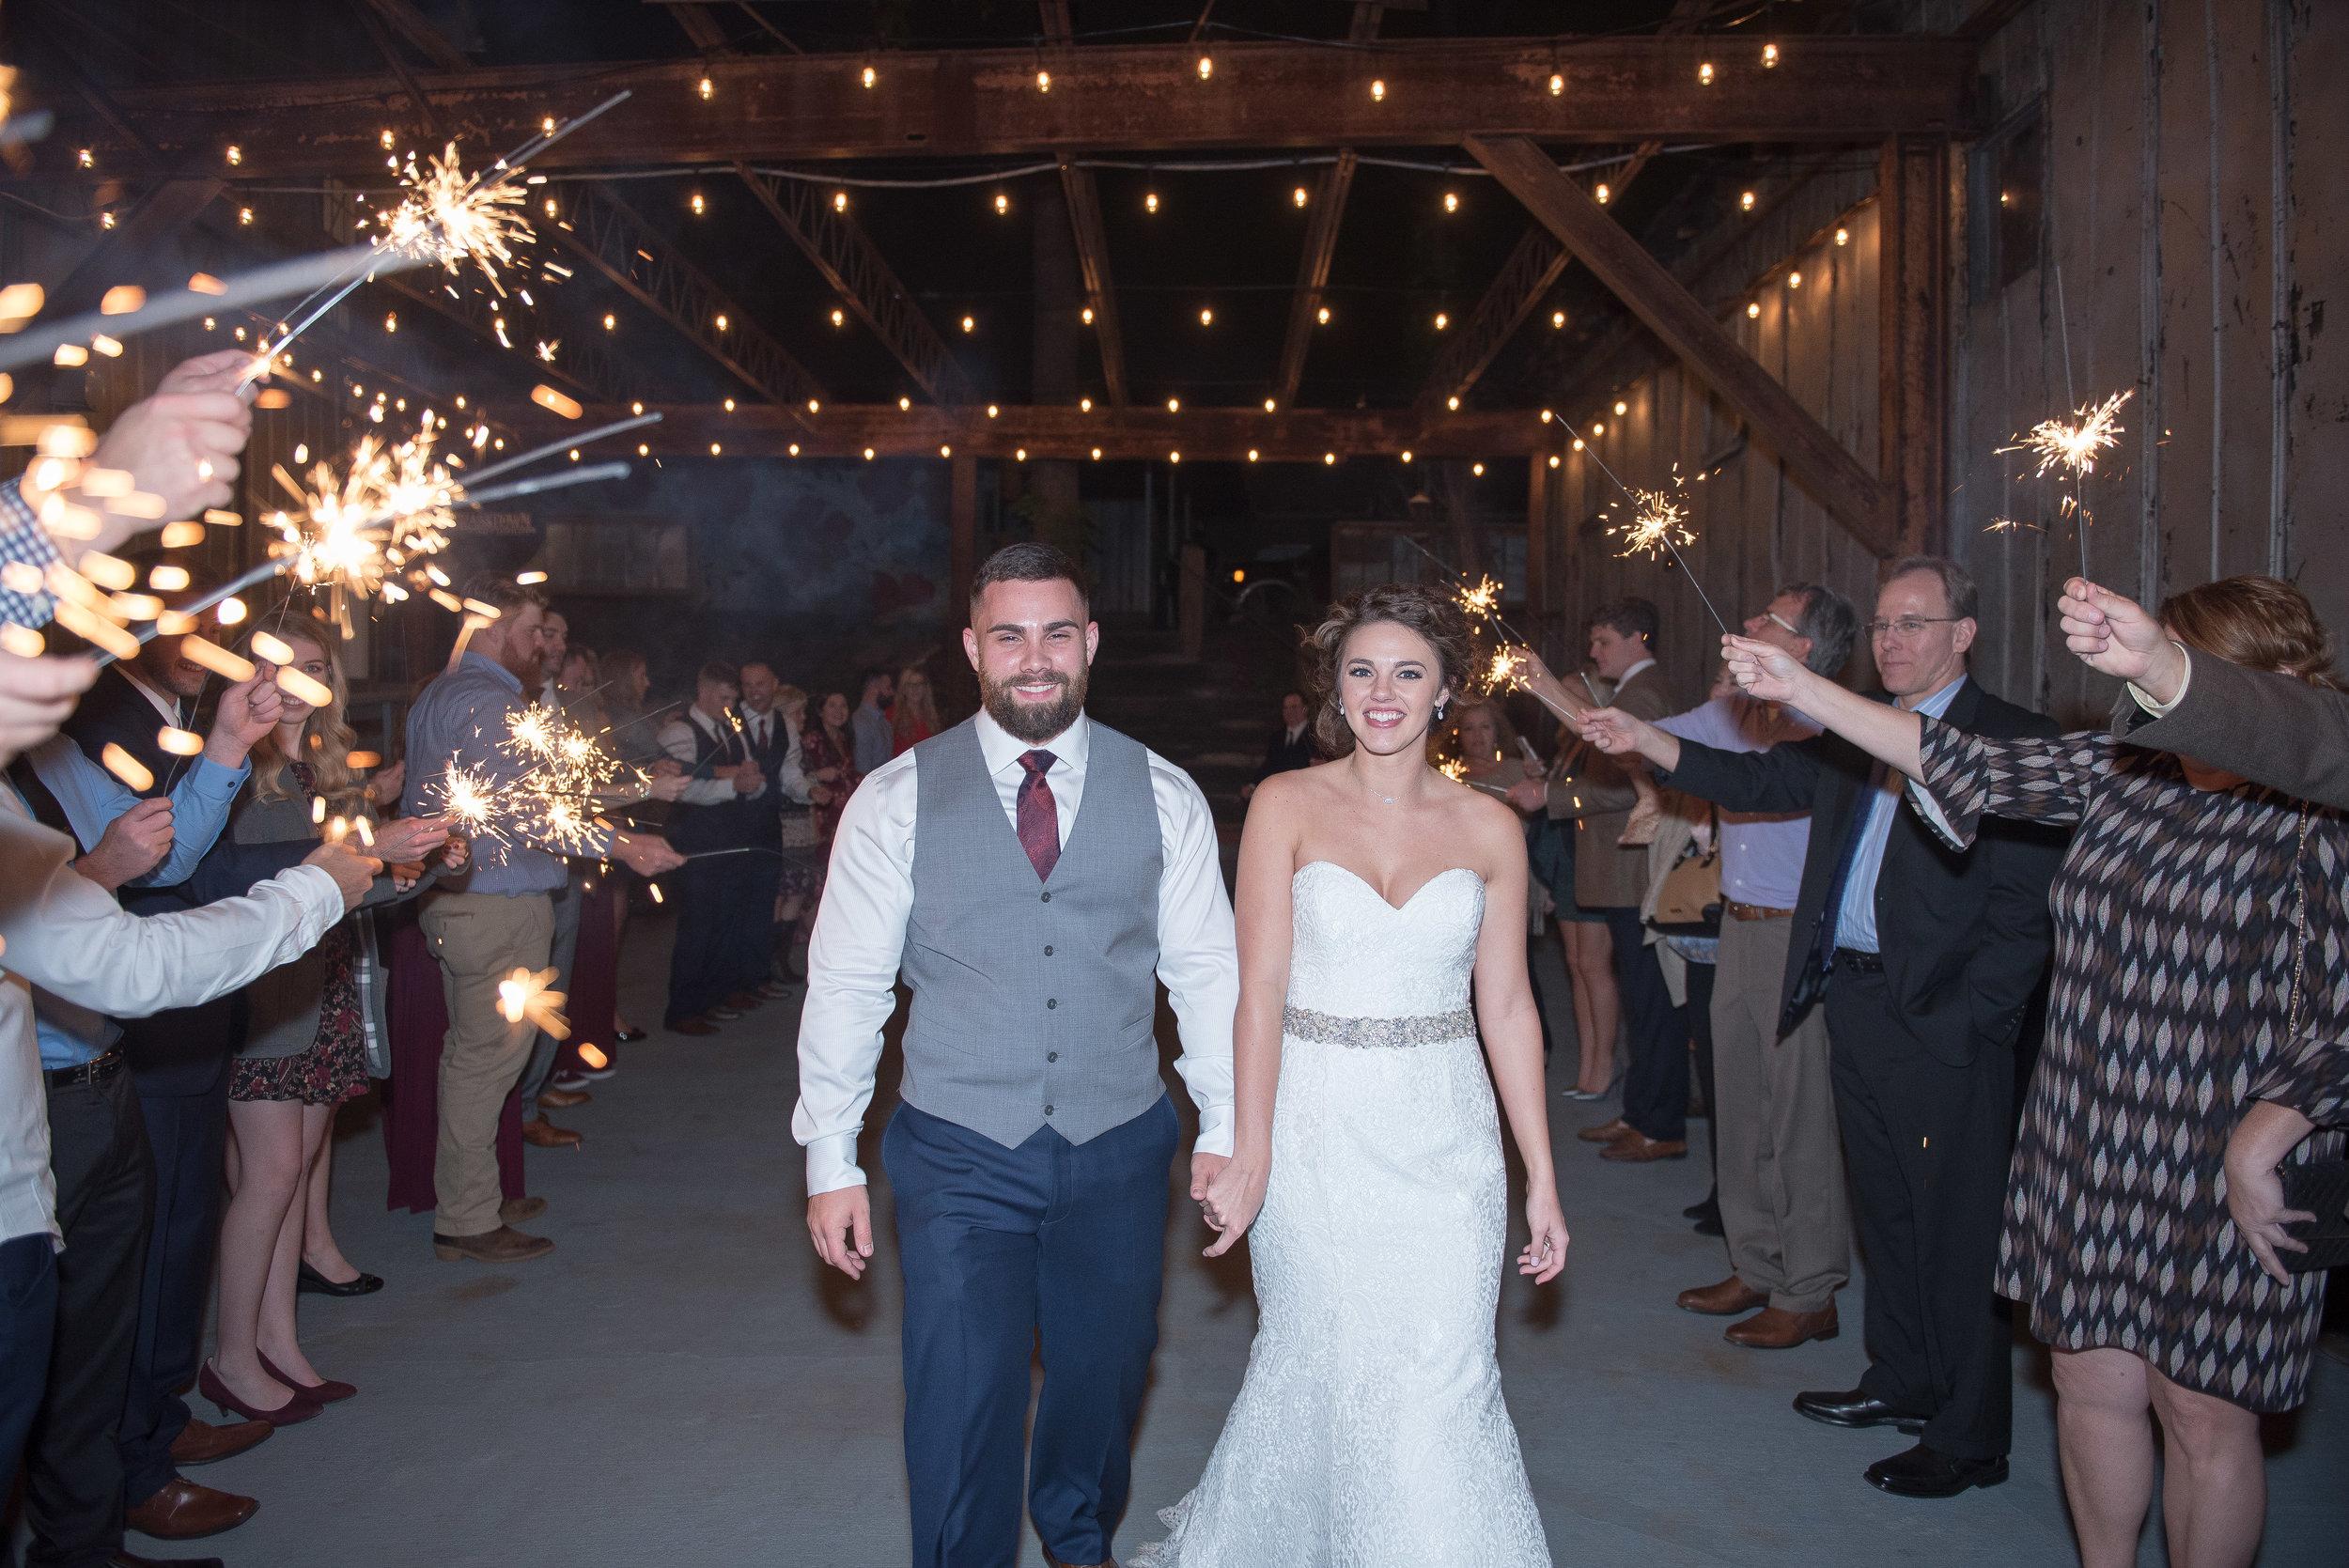 The Roller Mill Events - Winston Salem Weddings - NC Weddings - High Point NC Weddings - Winston Salem Venue - Yasmin Leonard Photography-91.jpg